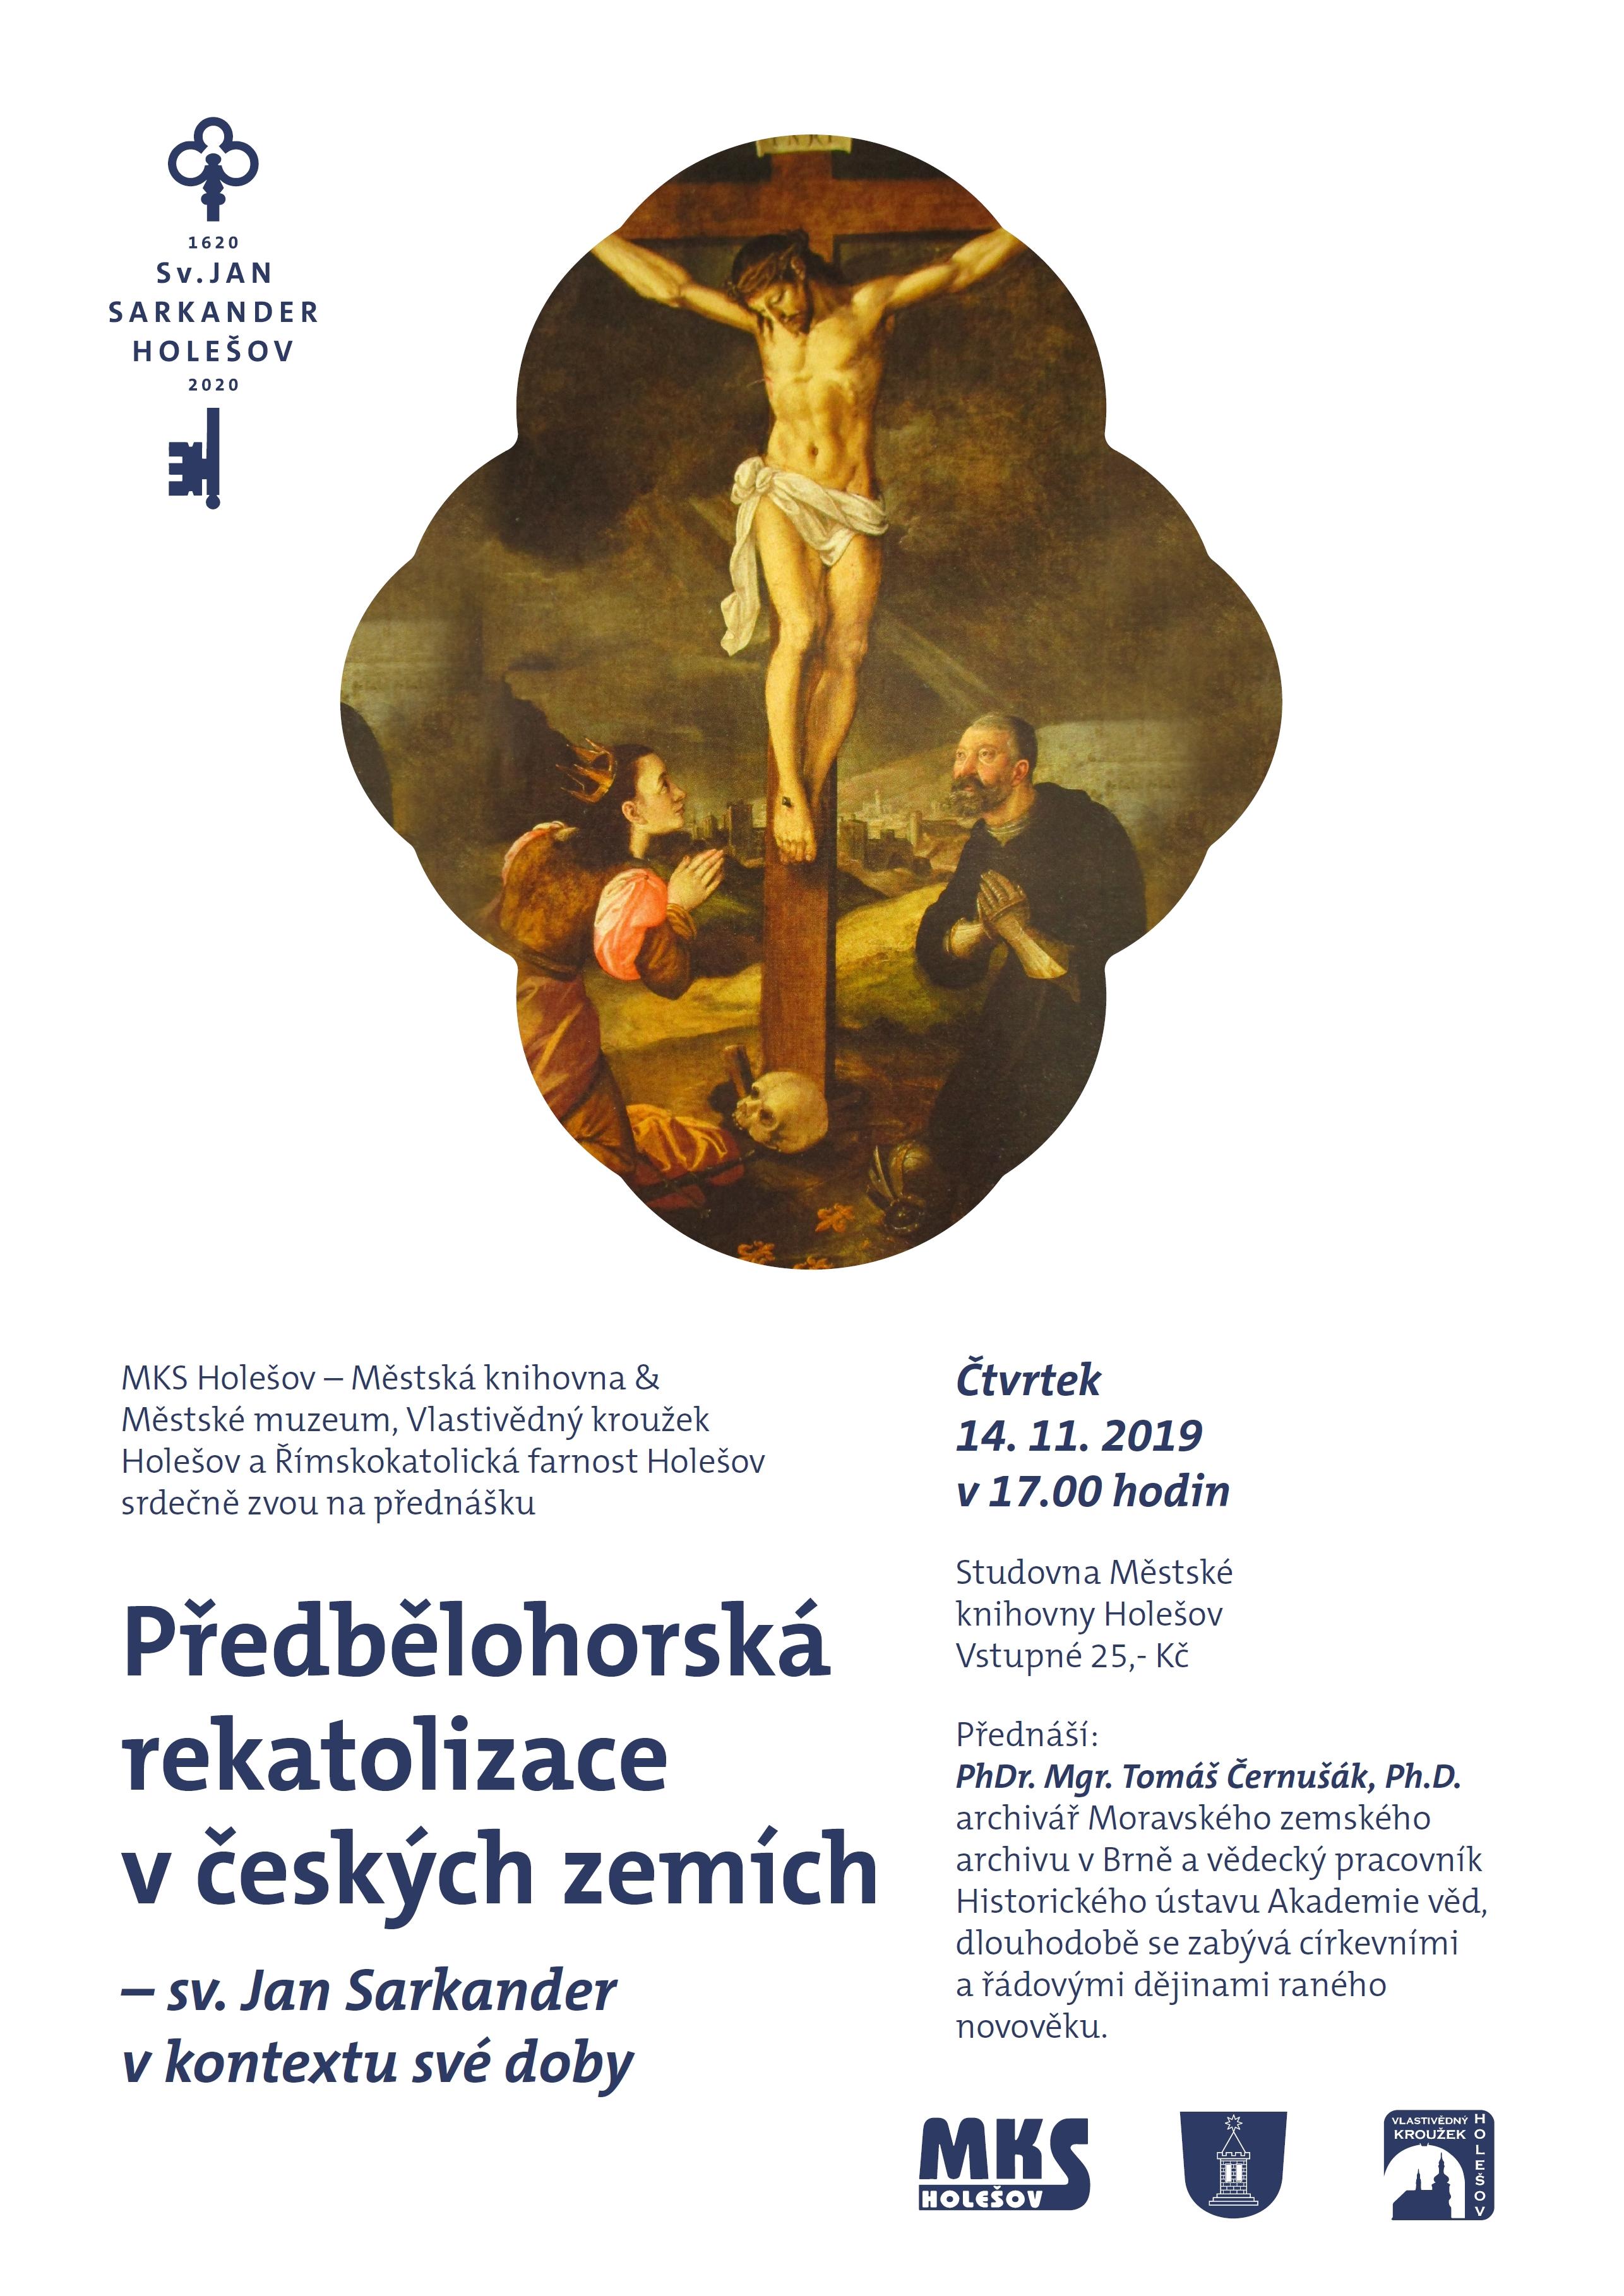 2019-11-14-predbelohorska-rekatolizace-v-ceskych-zemich-plakat.jpg